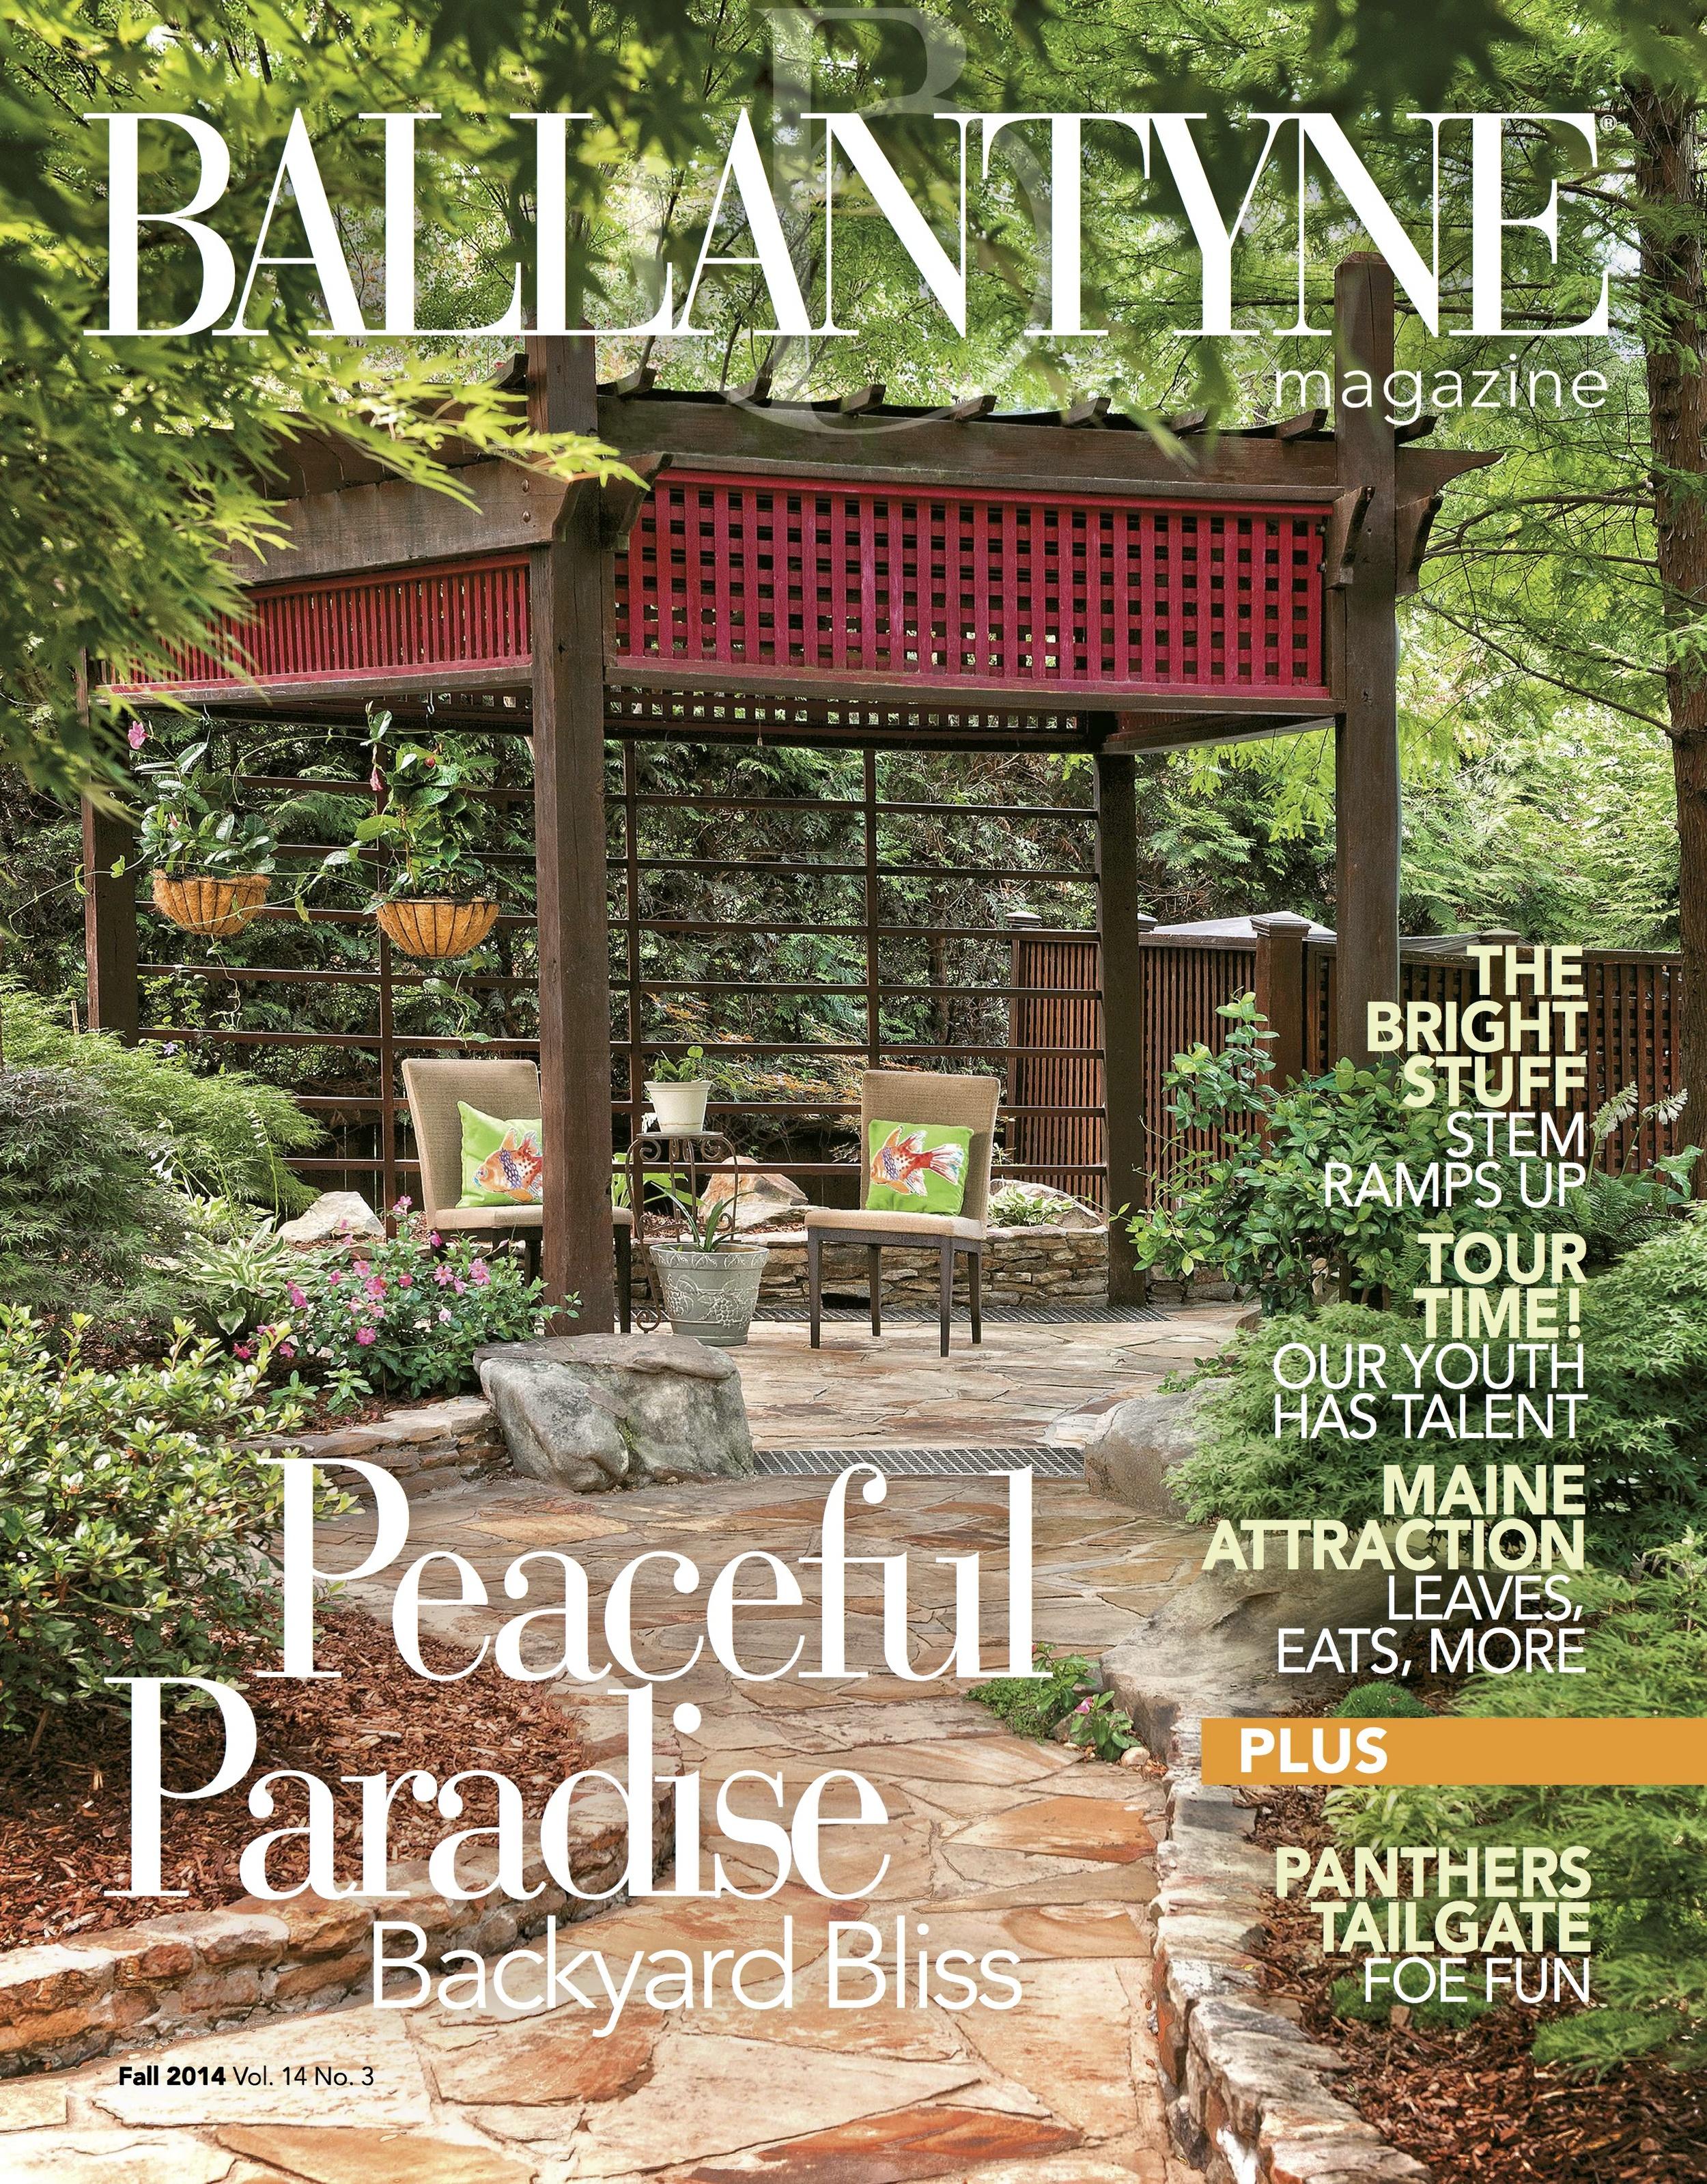 Ballantyne Magazine, Fall 2014